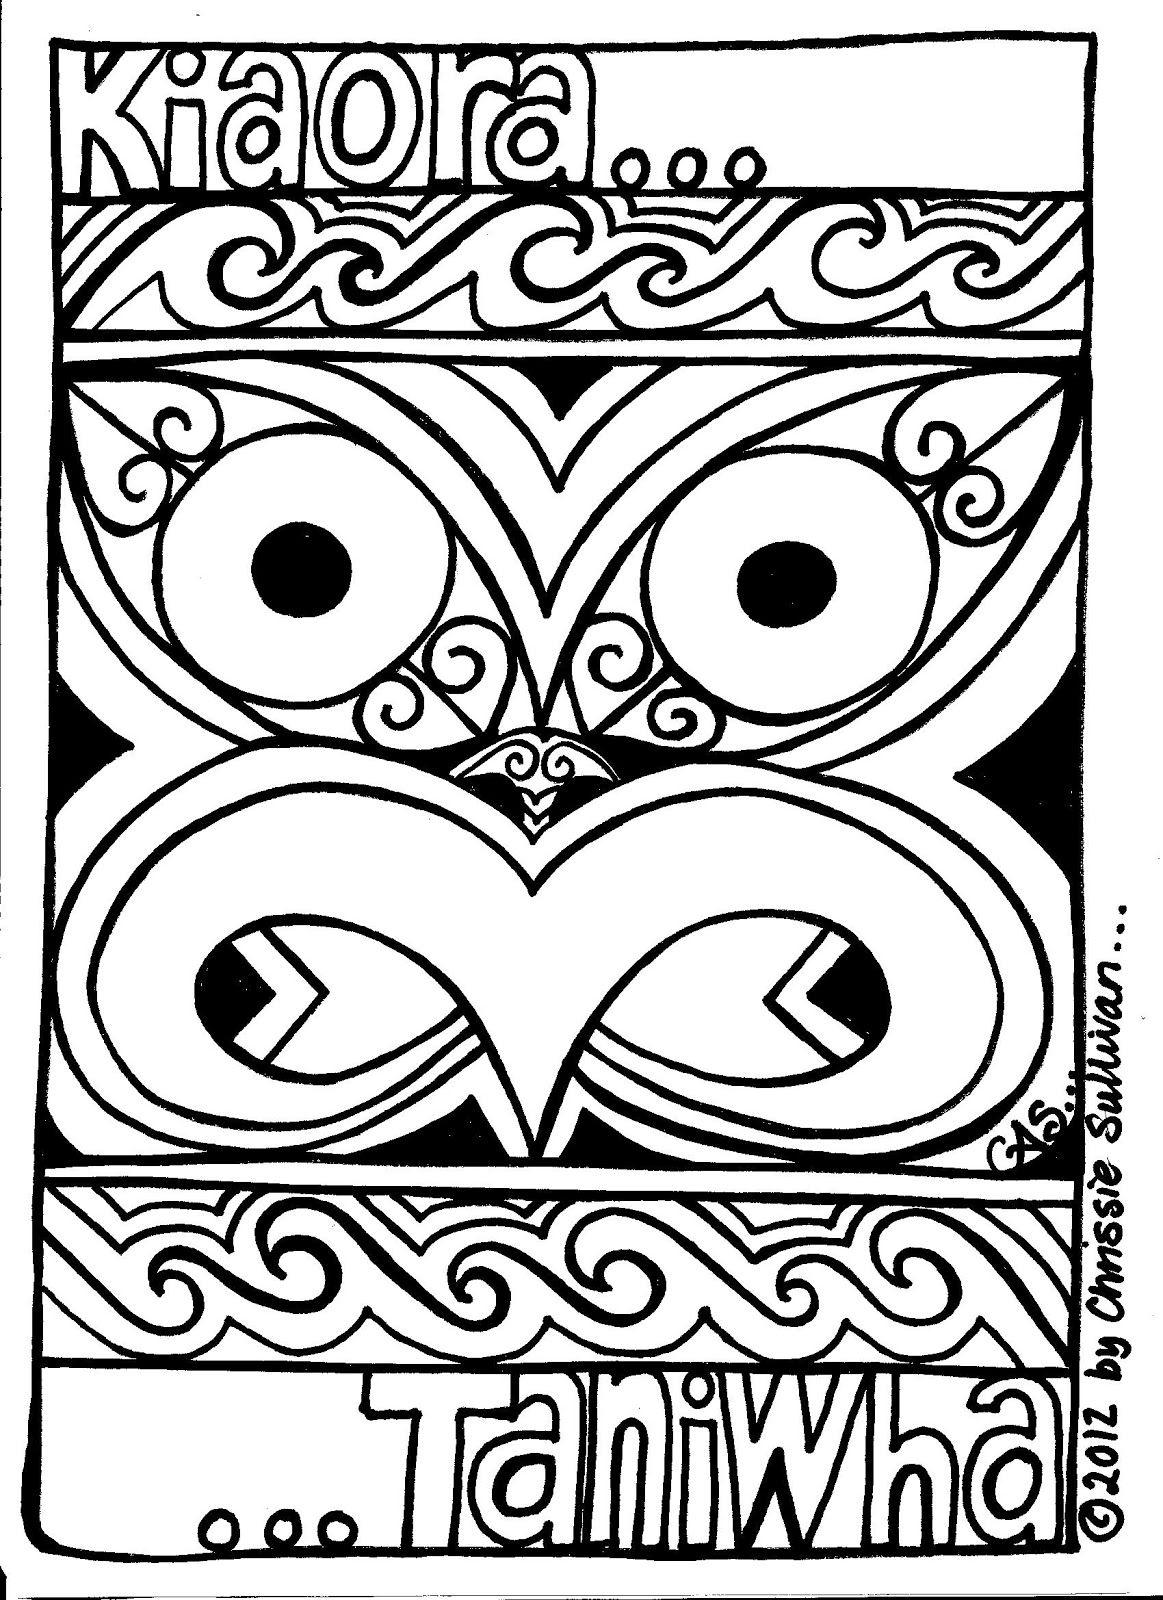 maori nz designs zealand samoan colouring crafts patterns resource kits legends symbols ece learning reisetagebuch lessons coloring middle waitangi printable